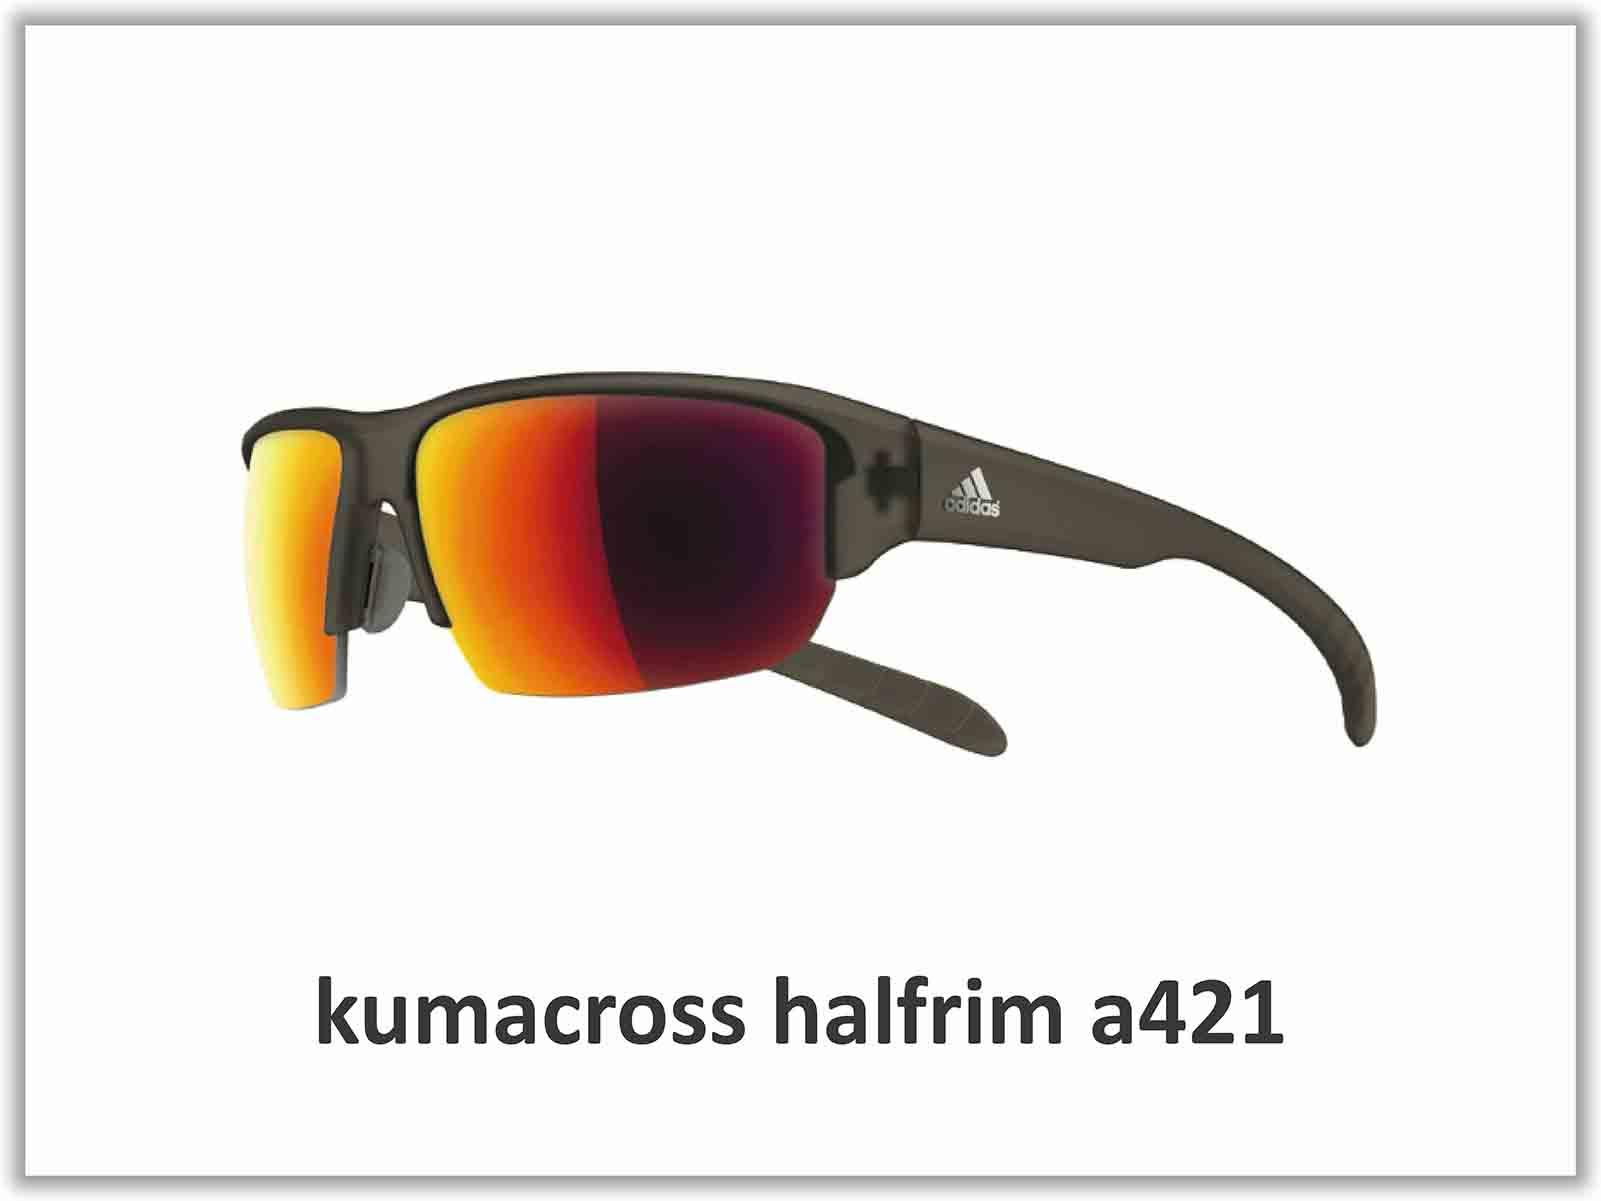 umacross-Halfrim-a421